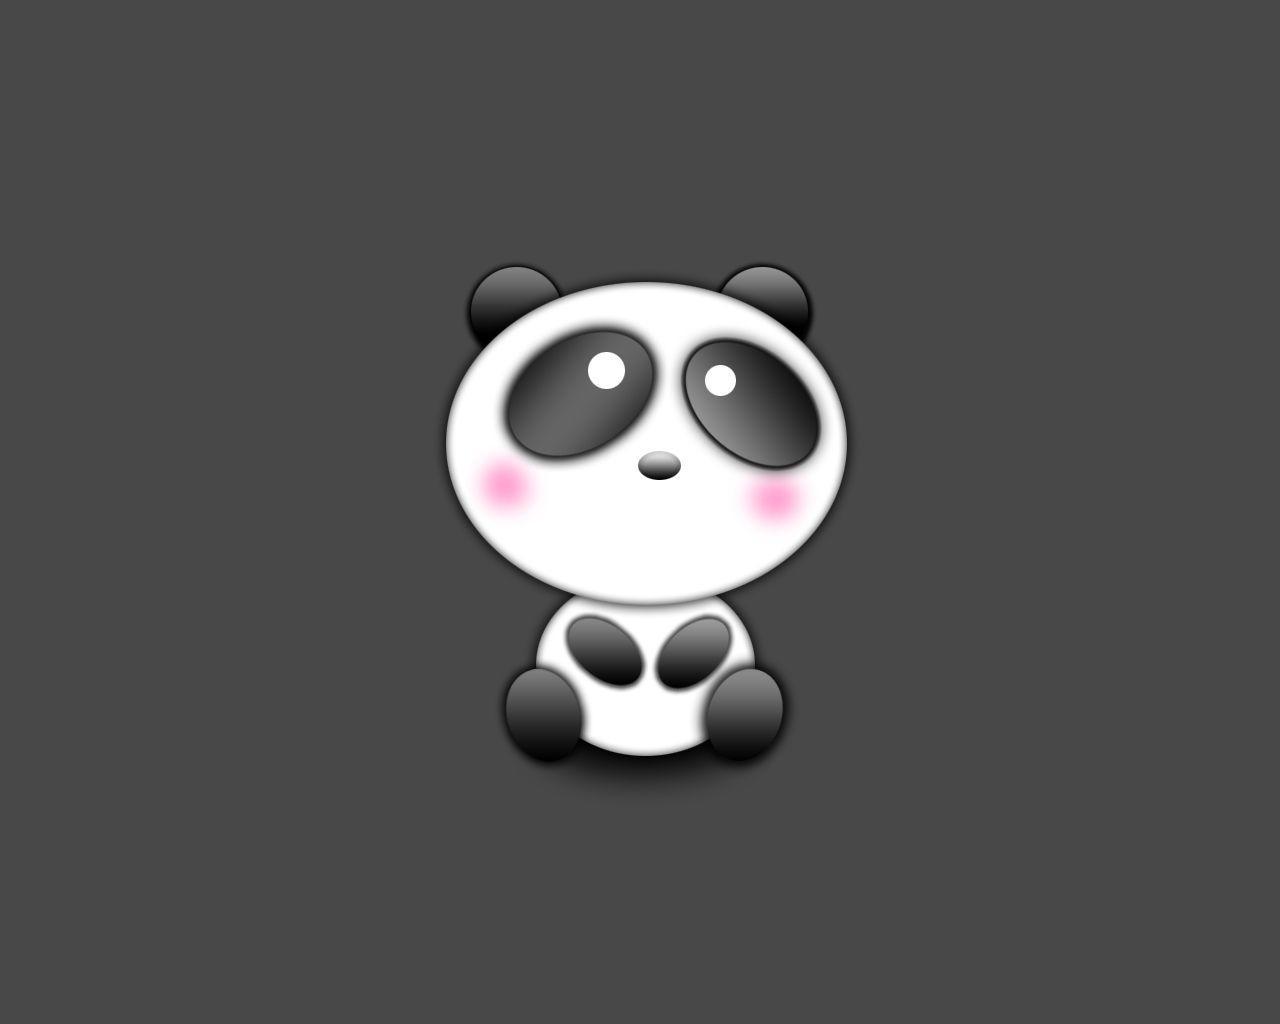 Anime panda wallpapers wallpaper cave - Panda anime wallpaper ...